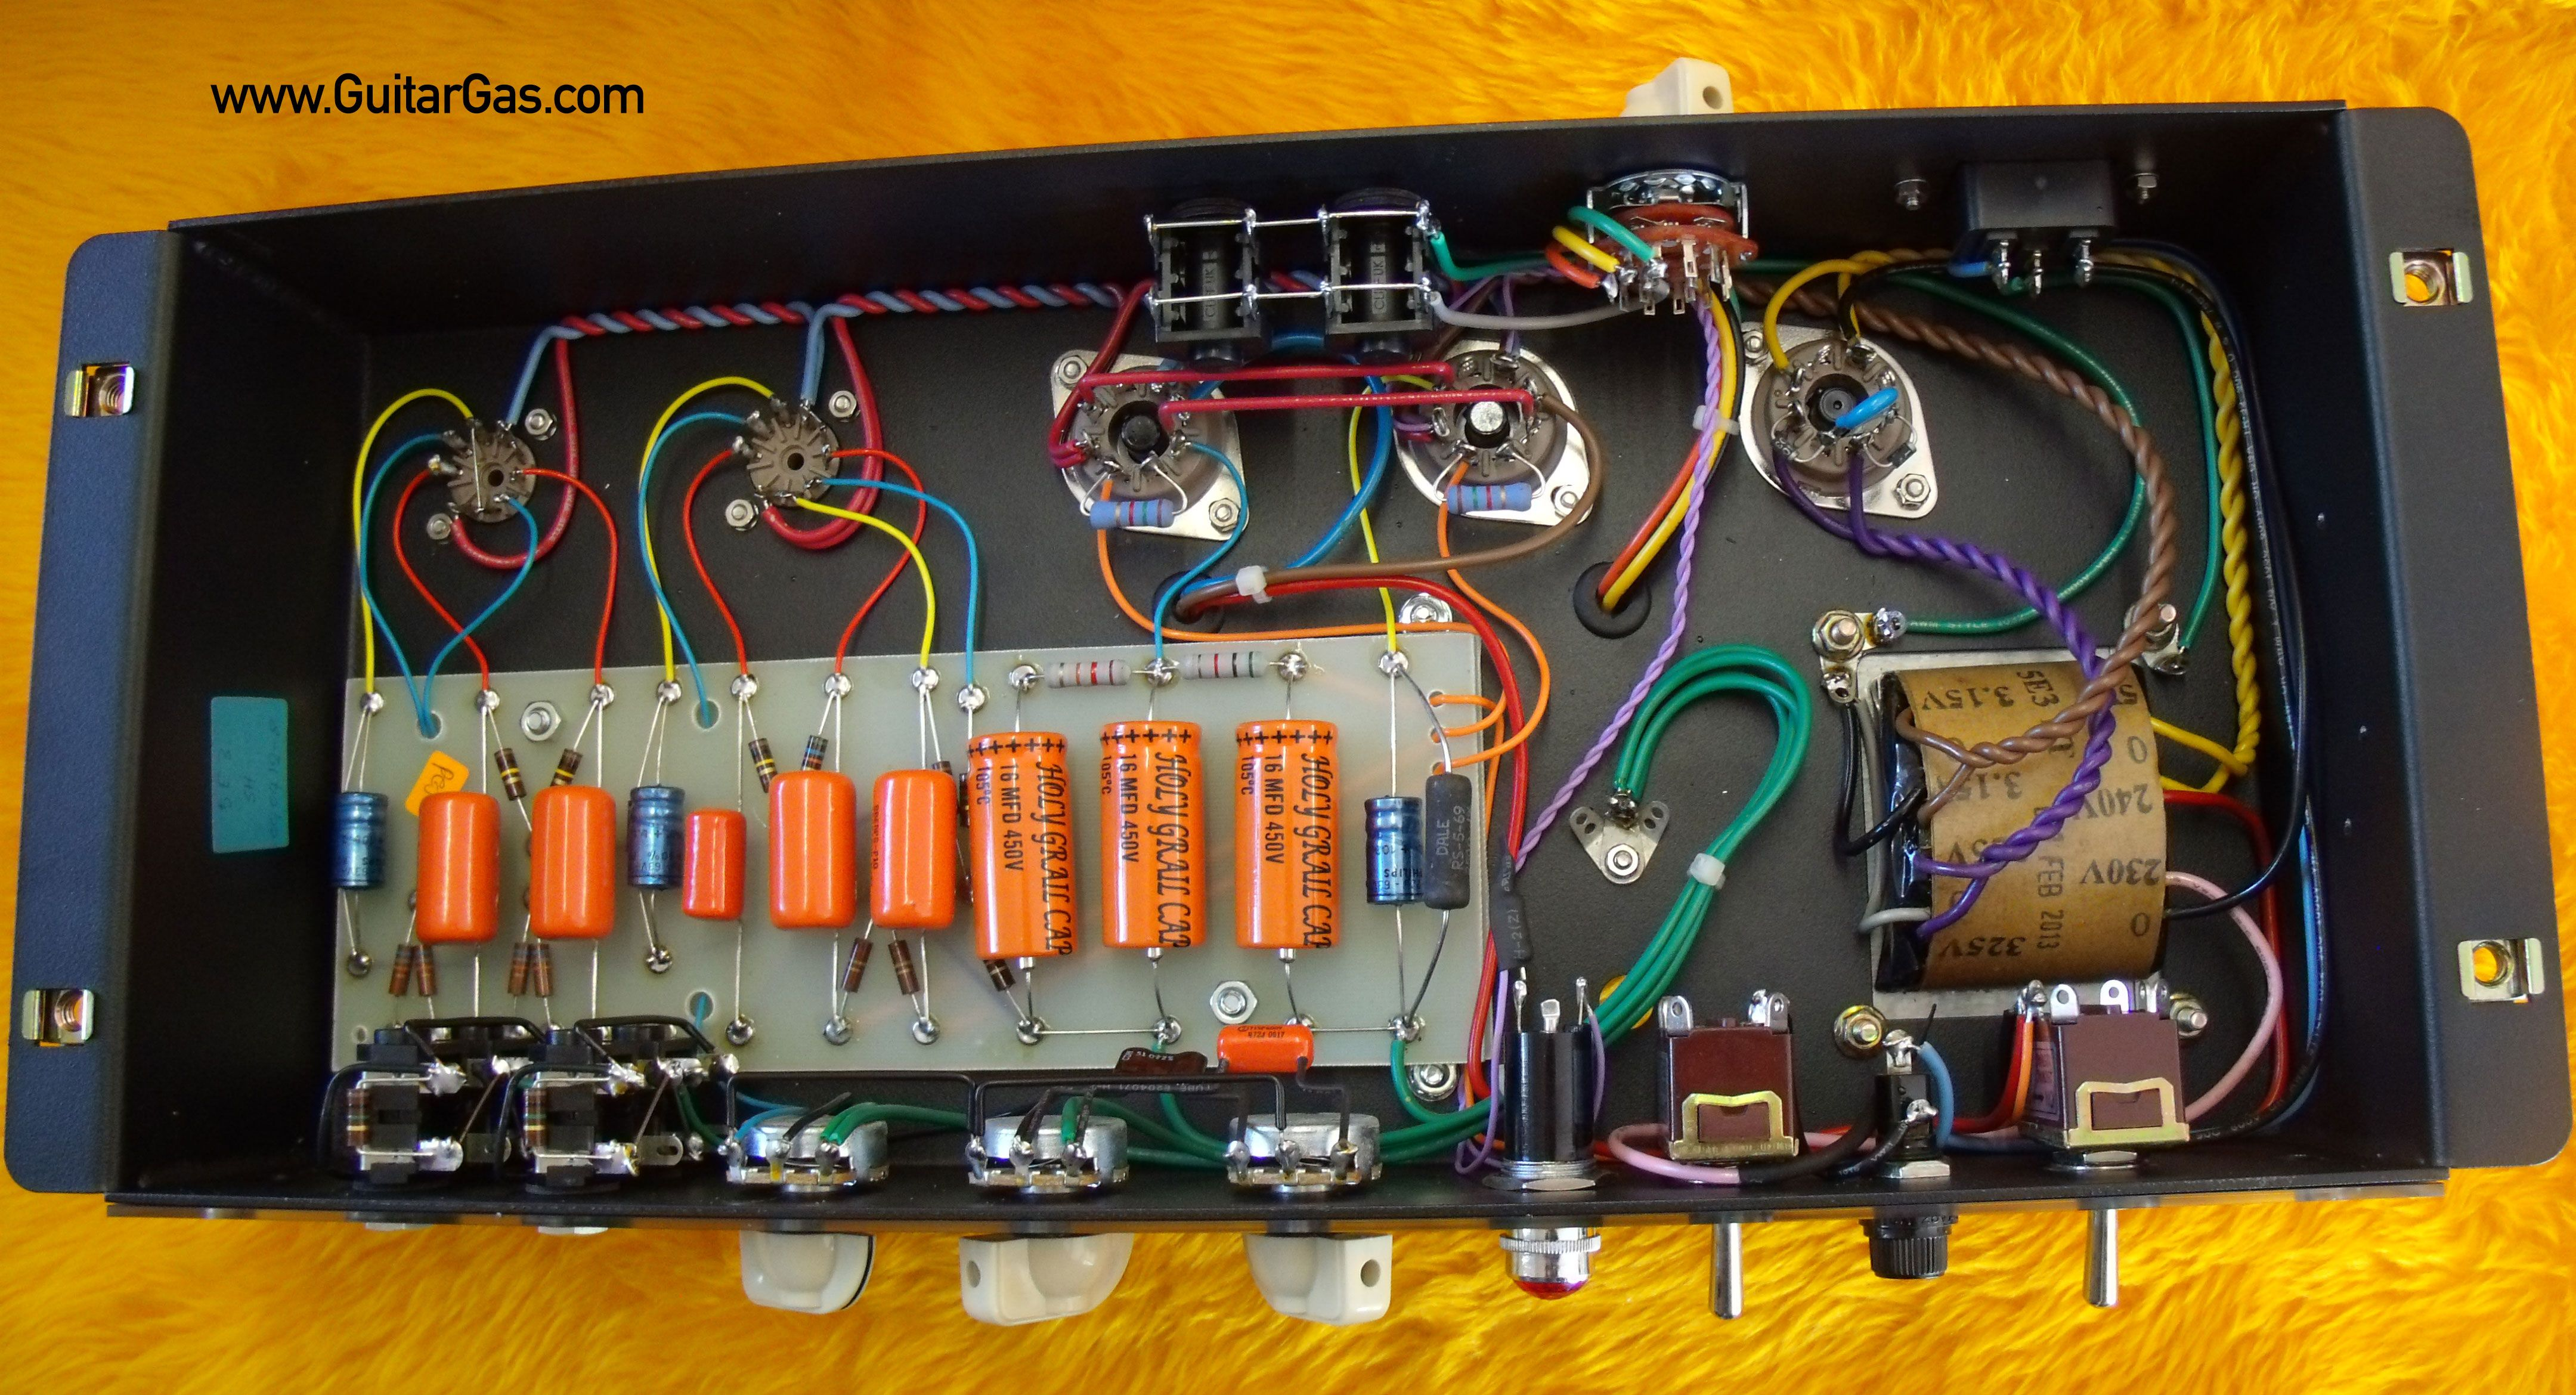 Ceriatone 5E3 Tweed Deluxe Circuit   Ceriatone 5E3 Tweed